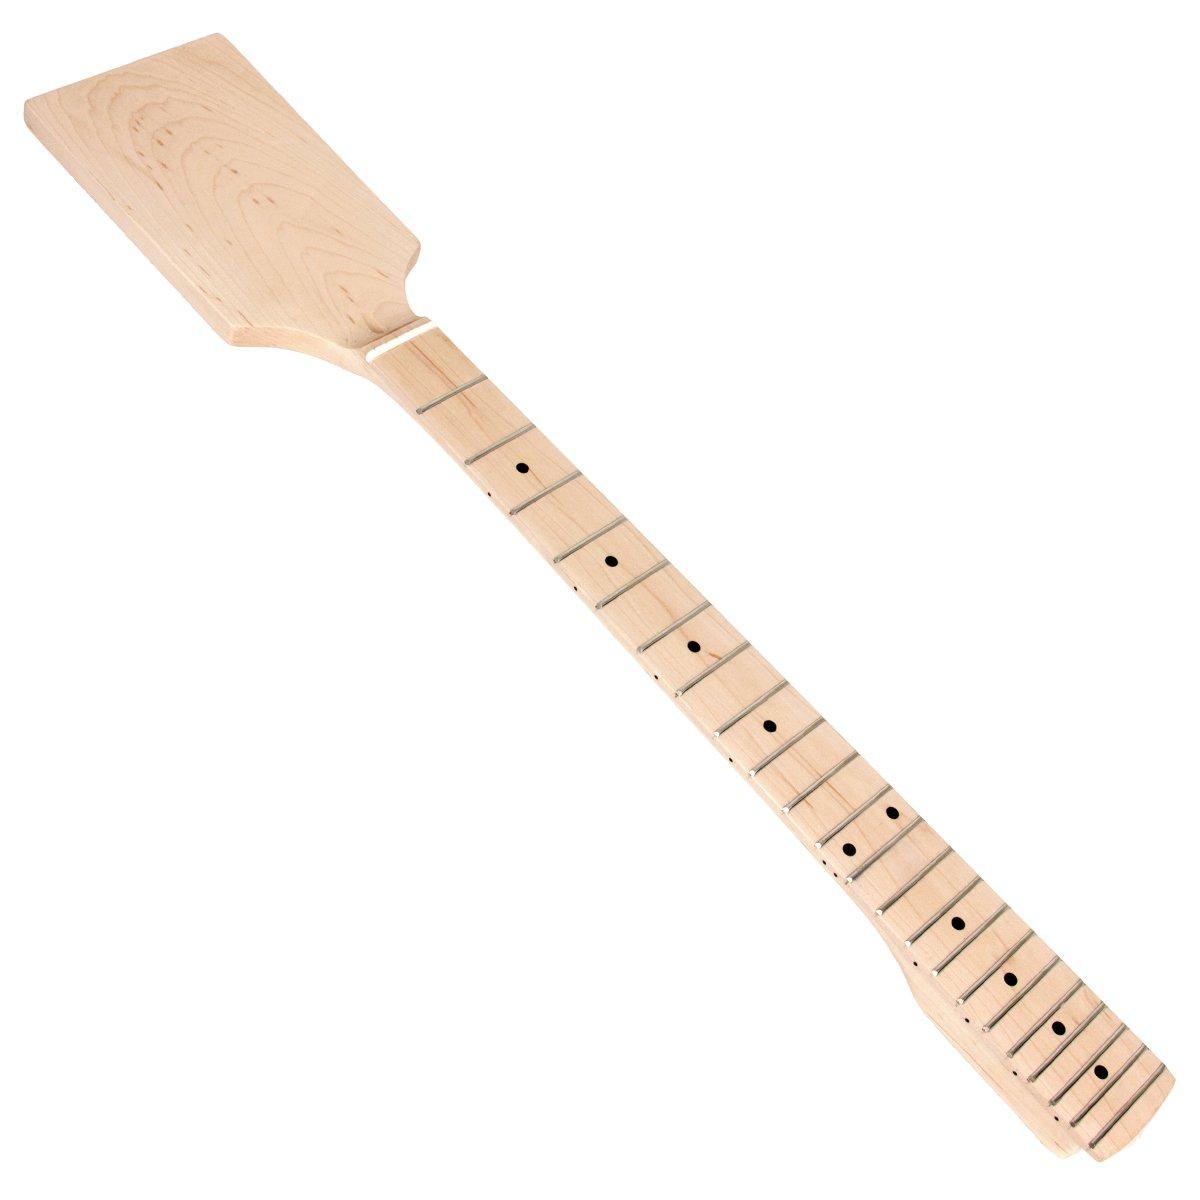 Kmise DIY Parts Clear Satin Maple 22 Fret Bolt on Paddle Headstock Electric Guitar Neck (4334250134) by Kmise (Image #9)